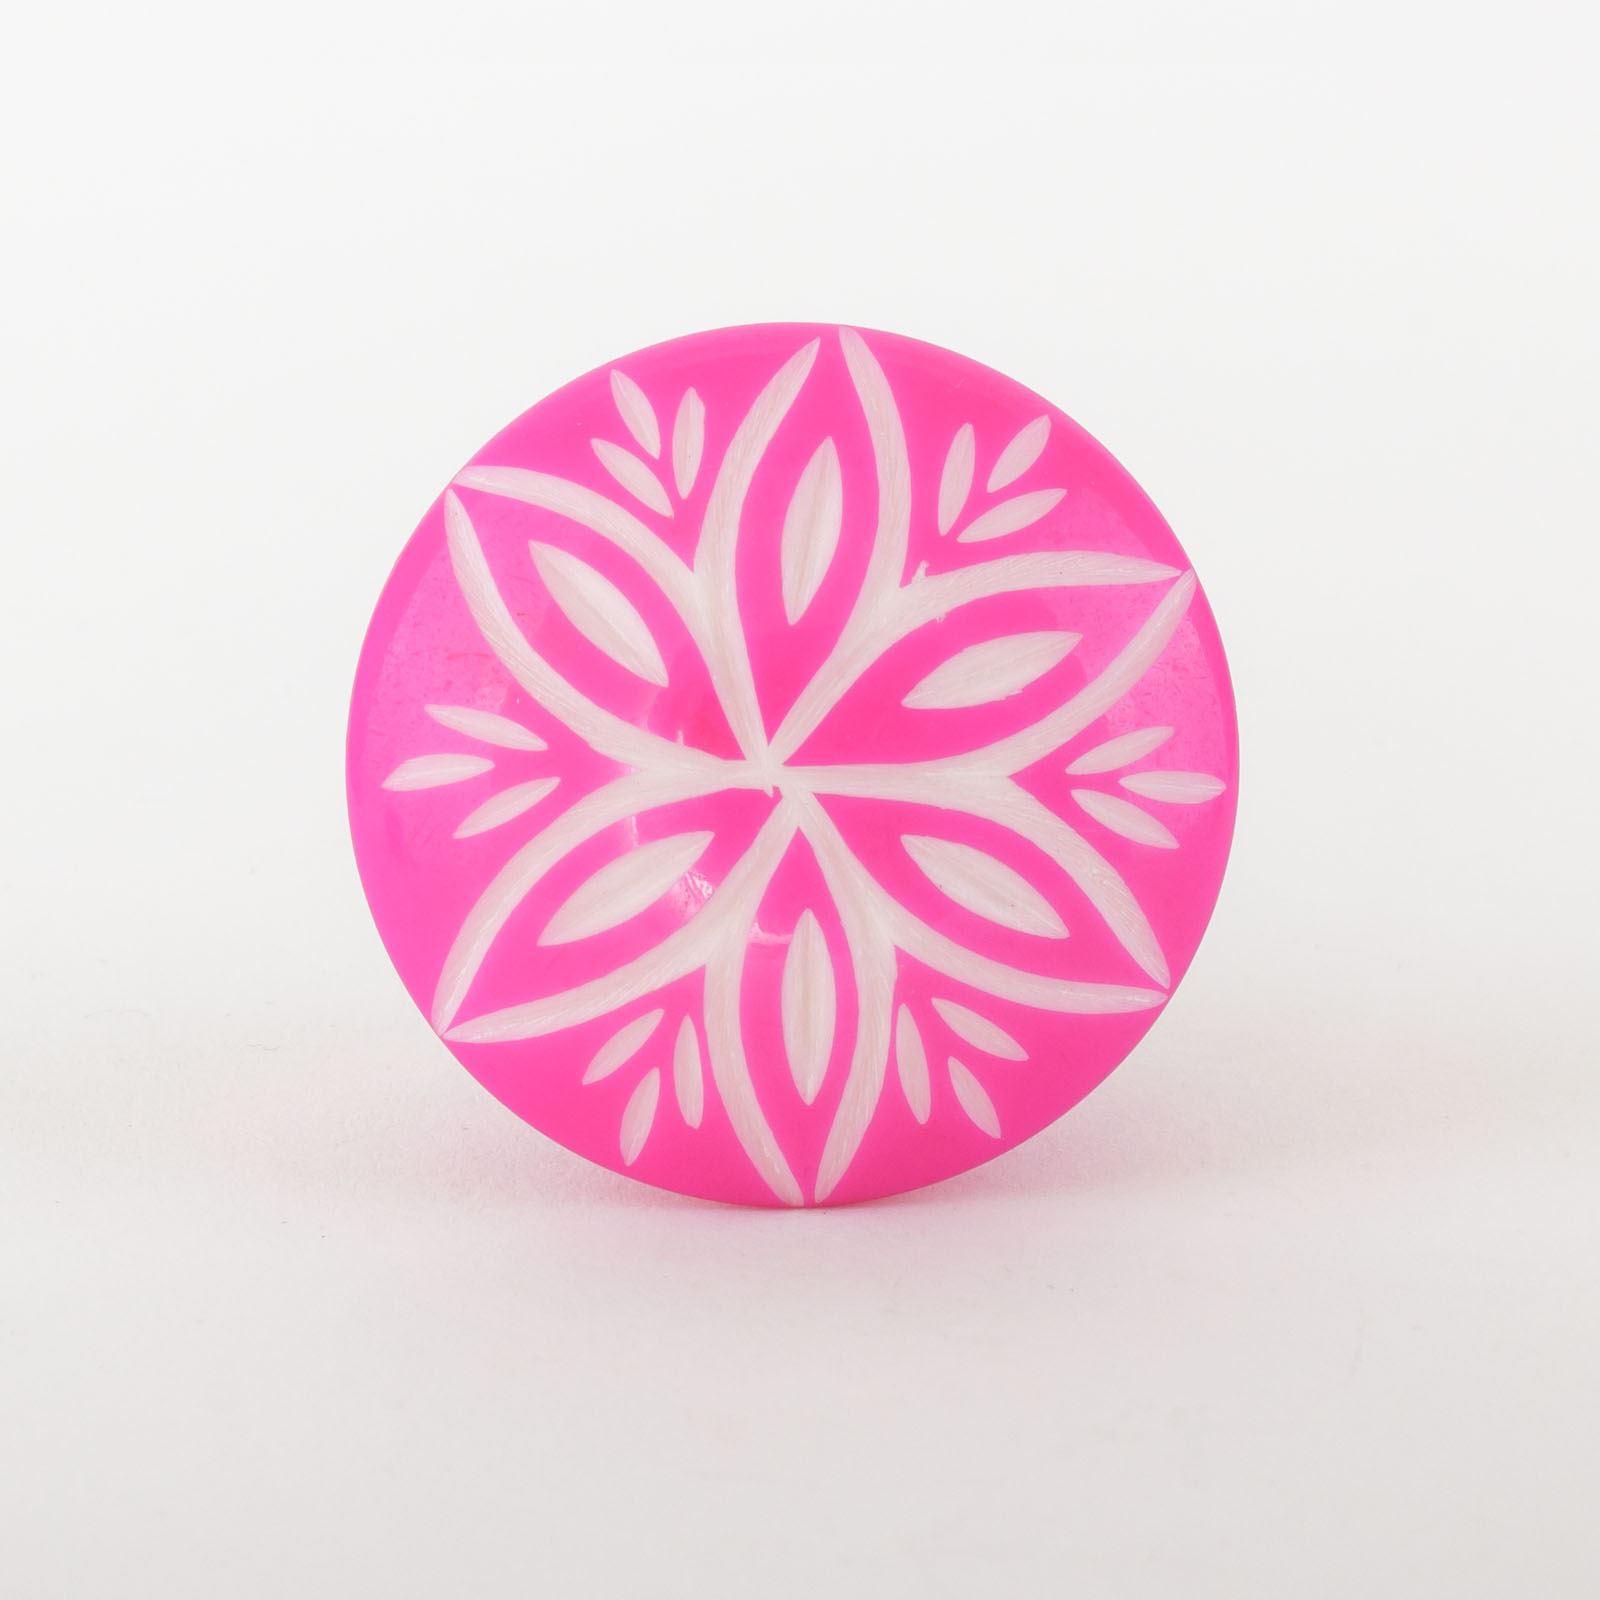 Pink Green Ceramic Resin Door Knobs Handles Furniture Drawer Pulls ...